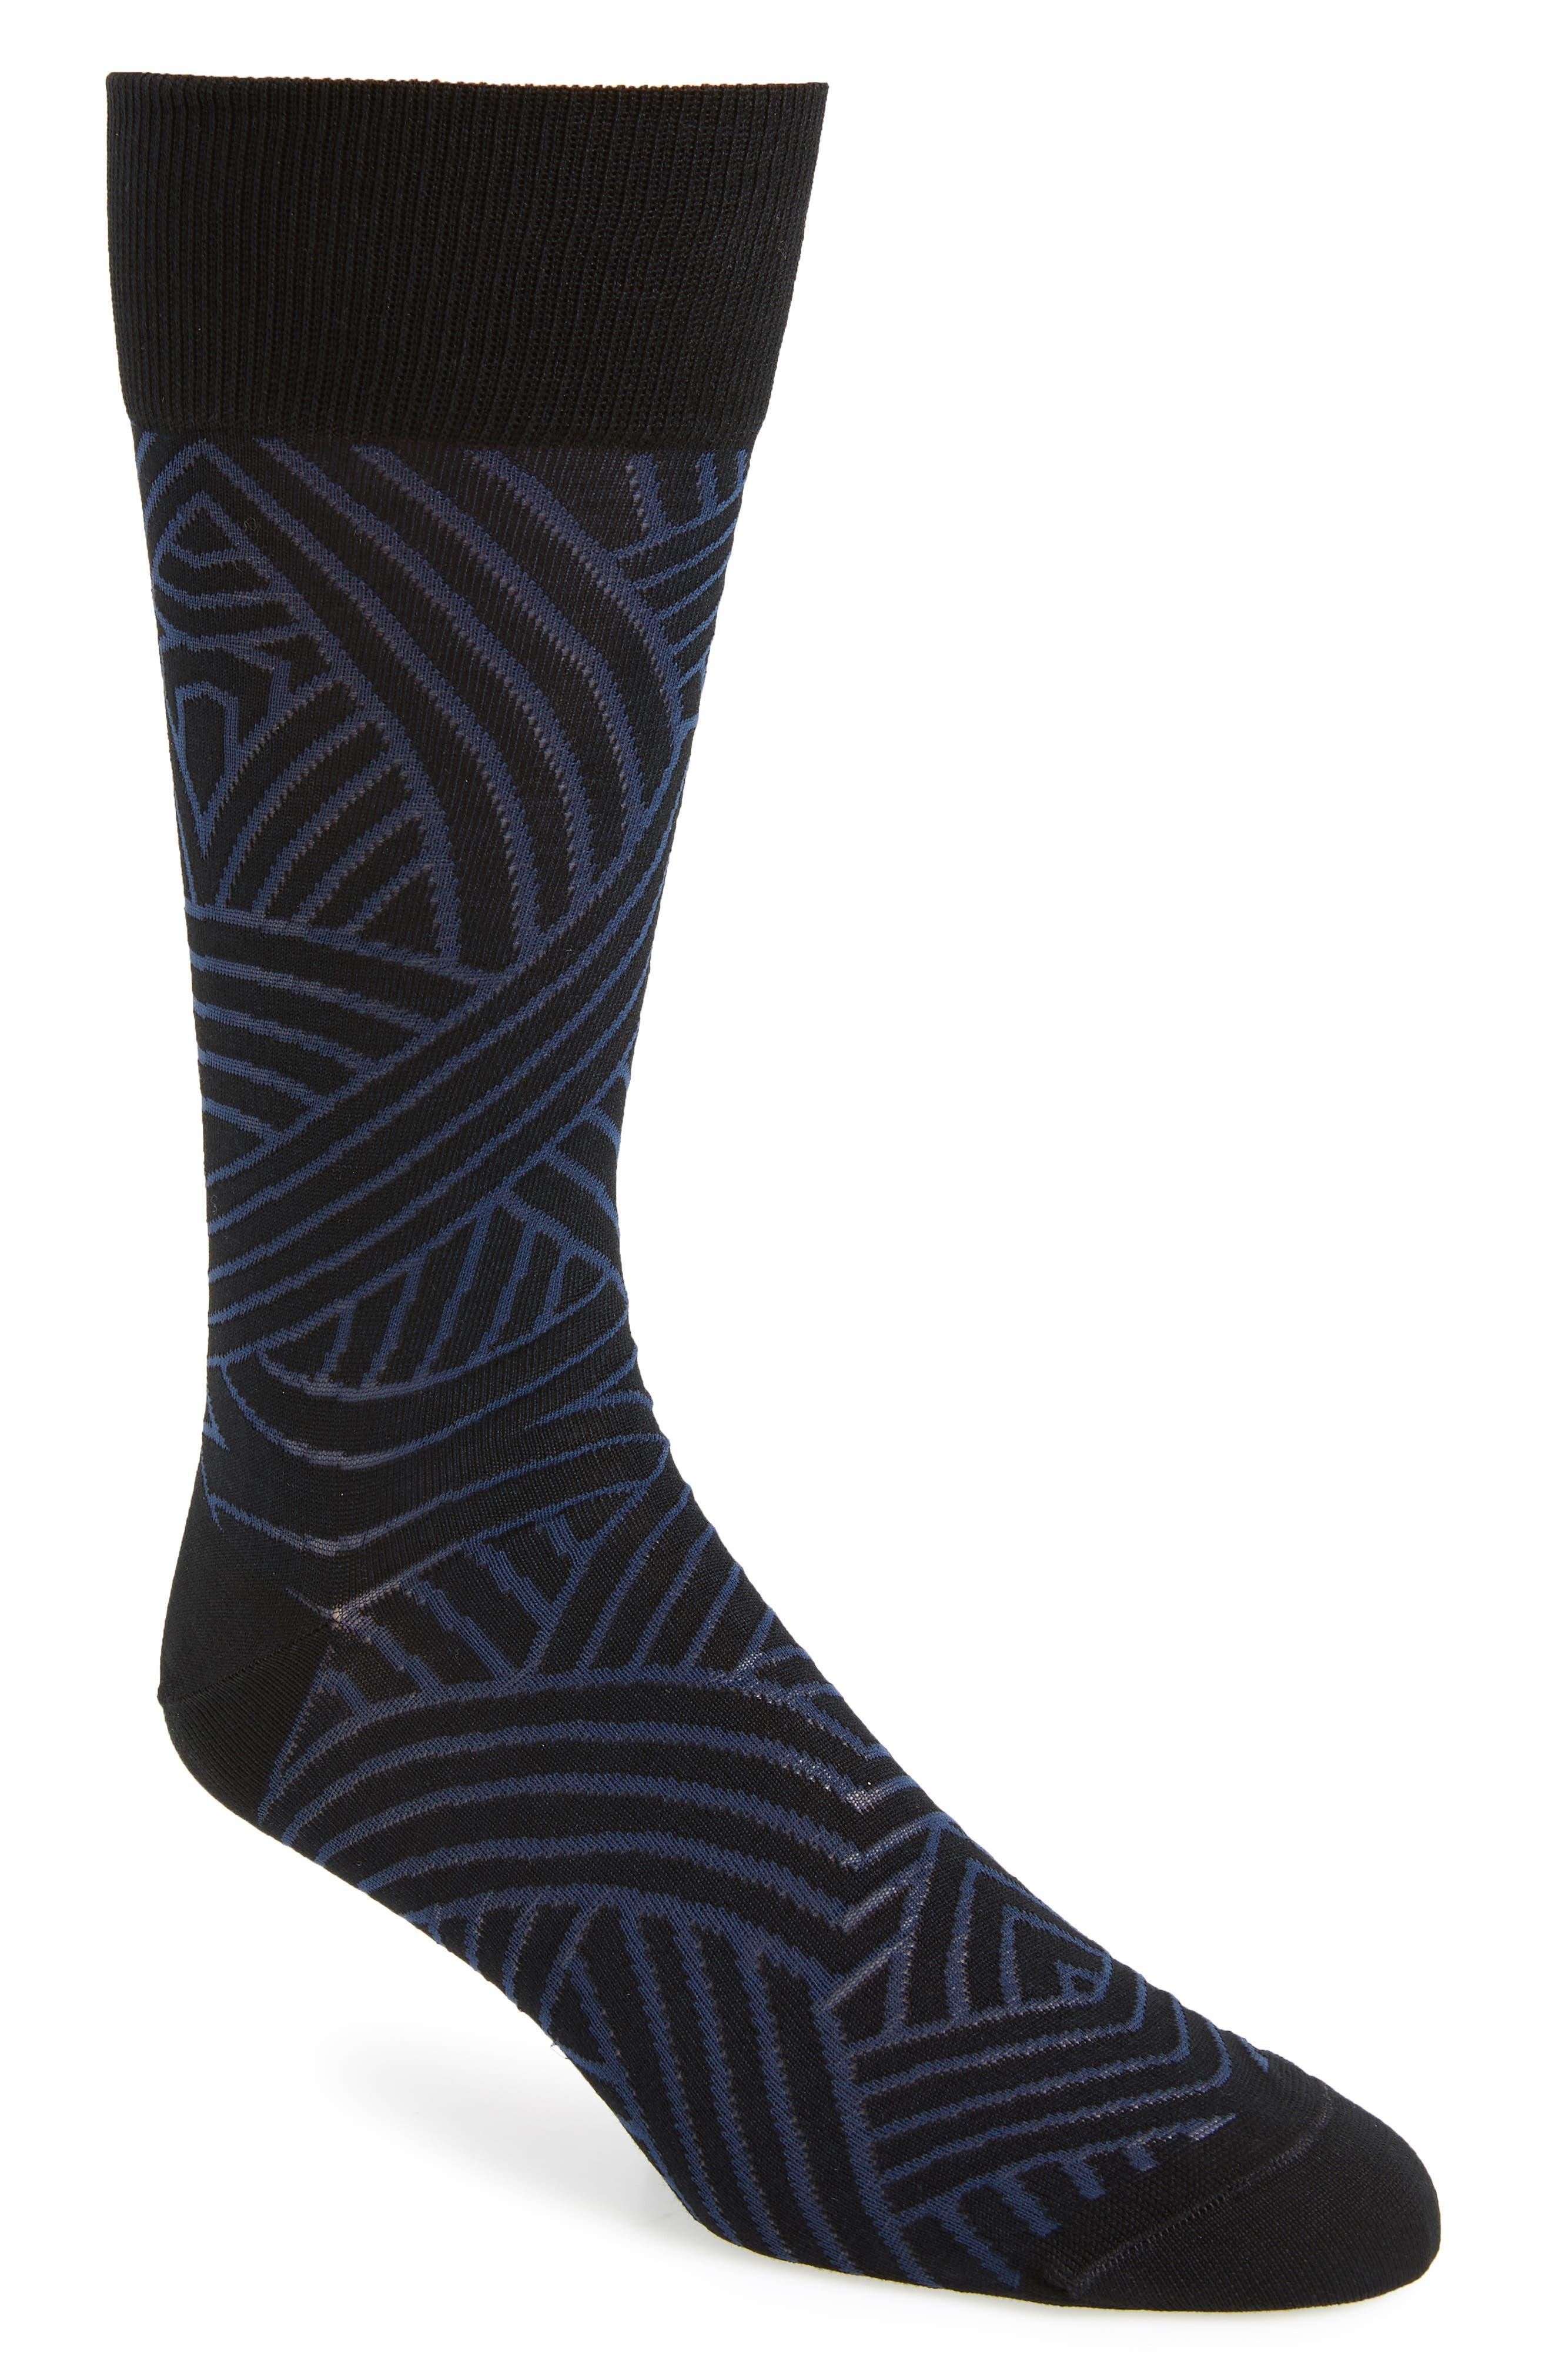 CALIBRATE Valencia Socks, Main, color, 005